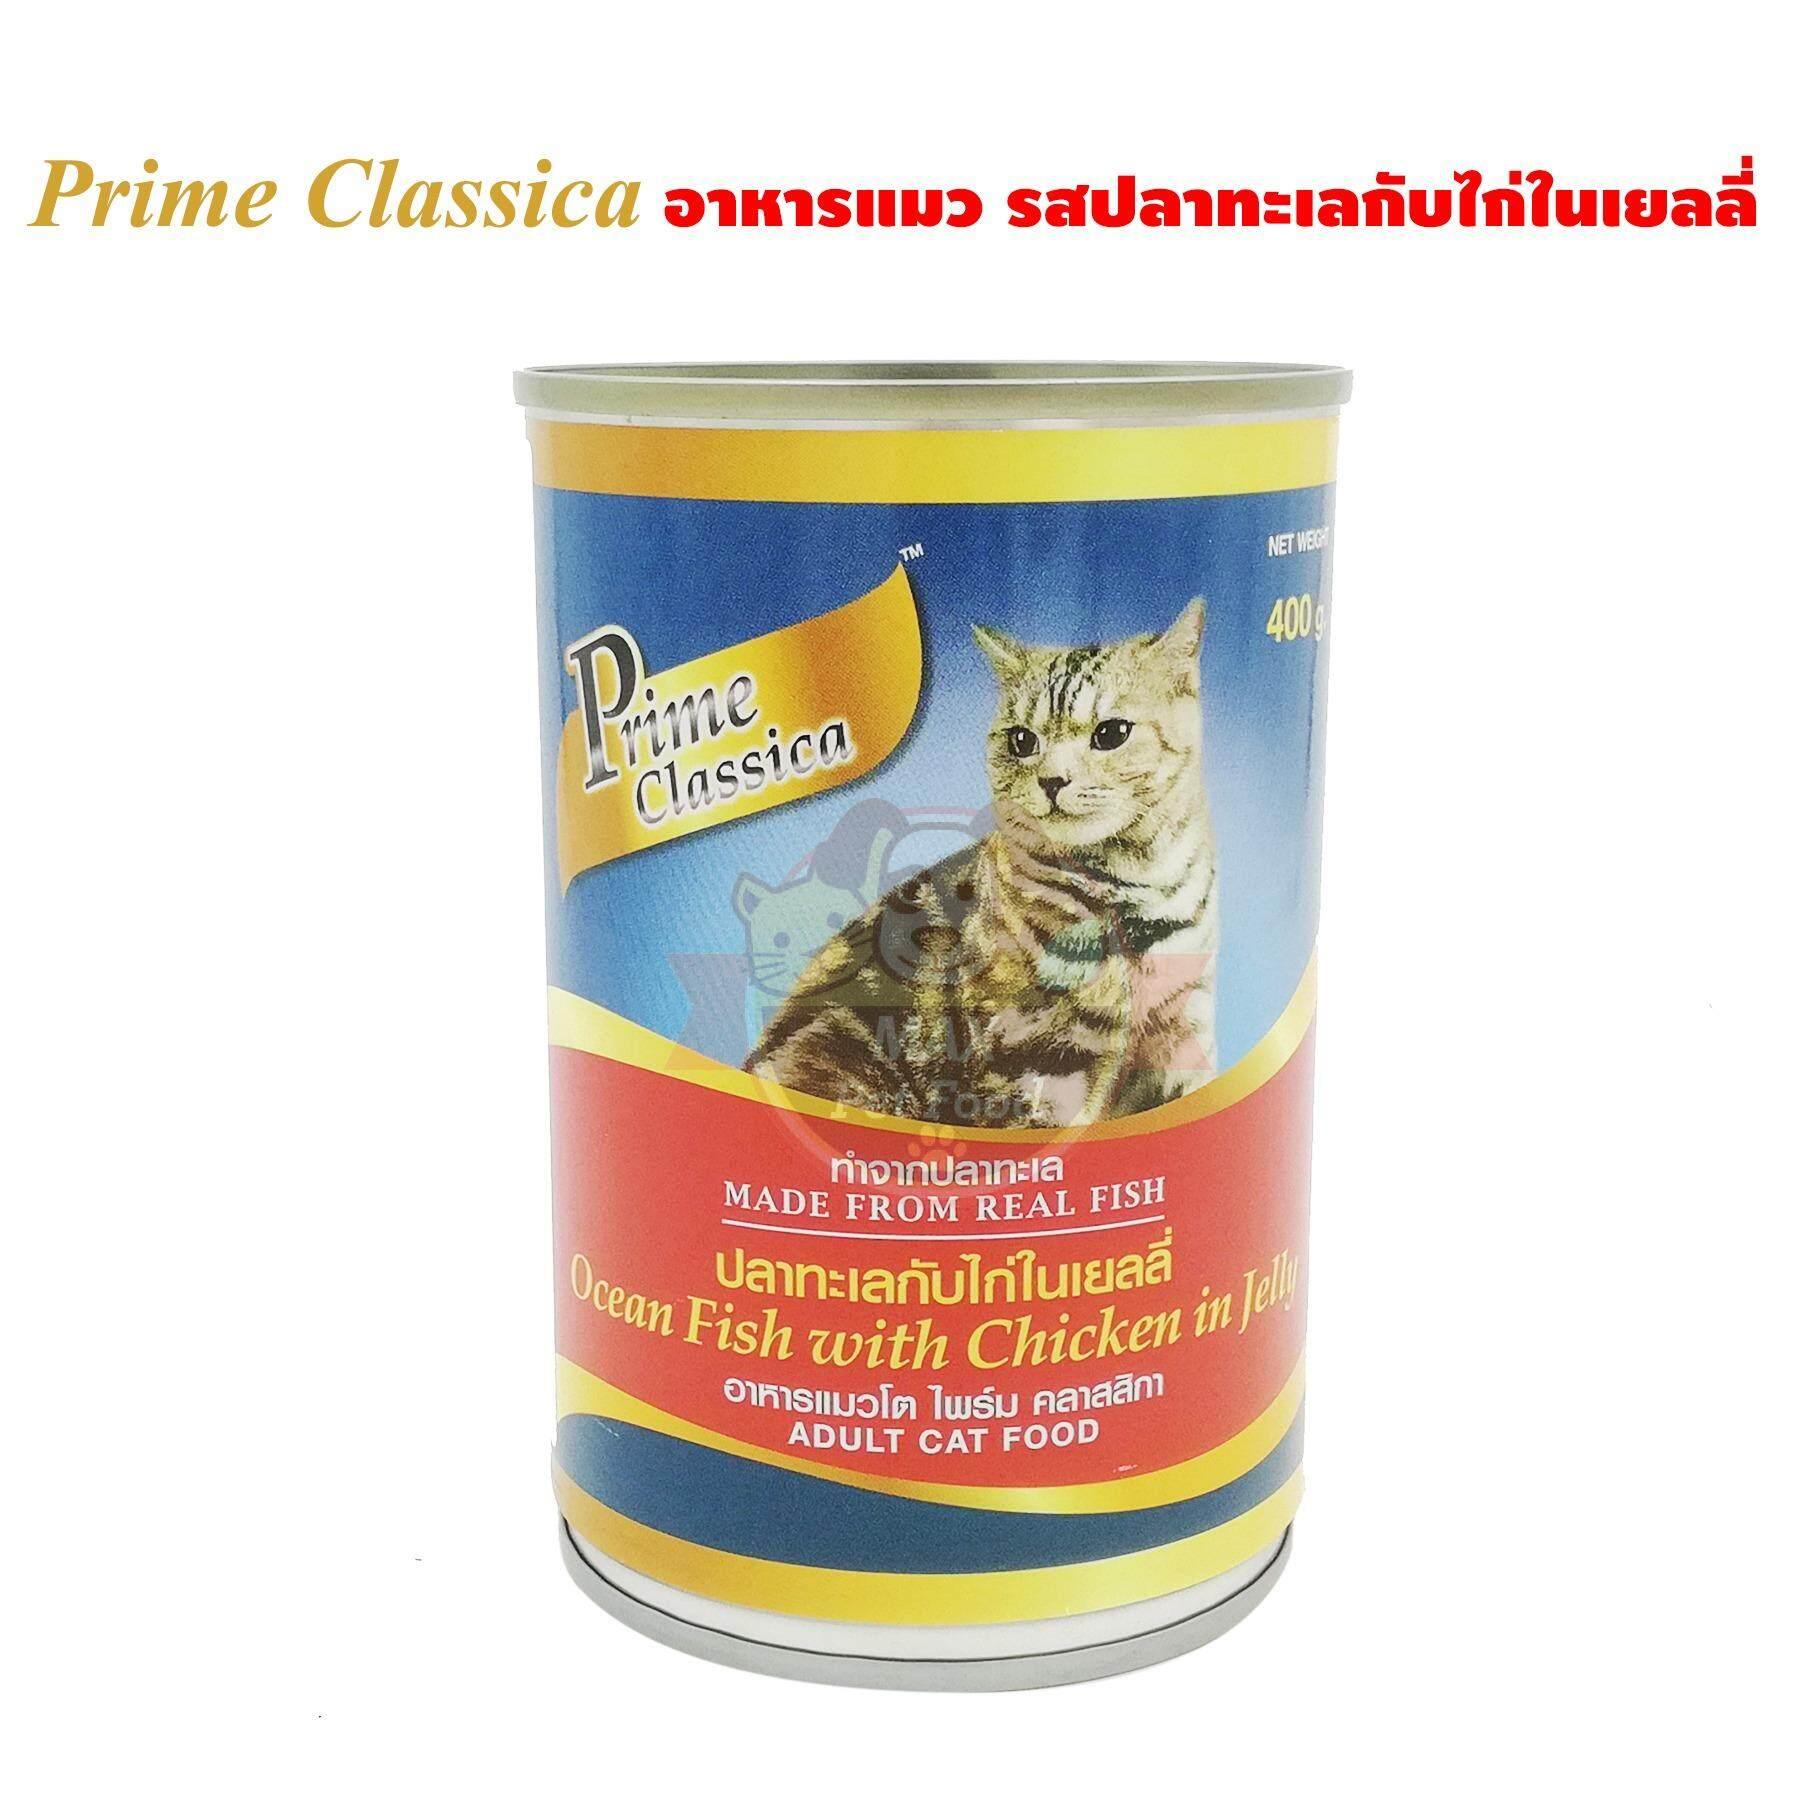 Prime Classica อาหารแมว พรีเมี่ยม ราคาประหยัด 400กรัม 1 กระป๋อง By Maxpetfood.